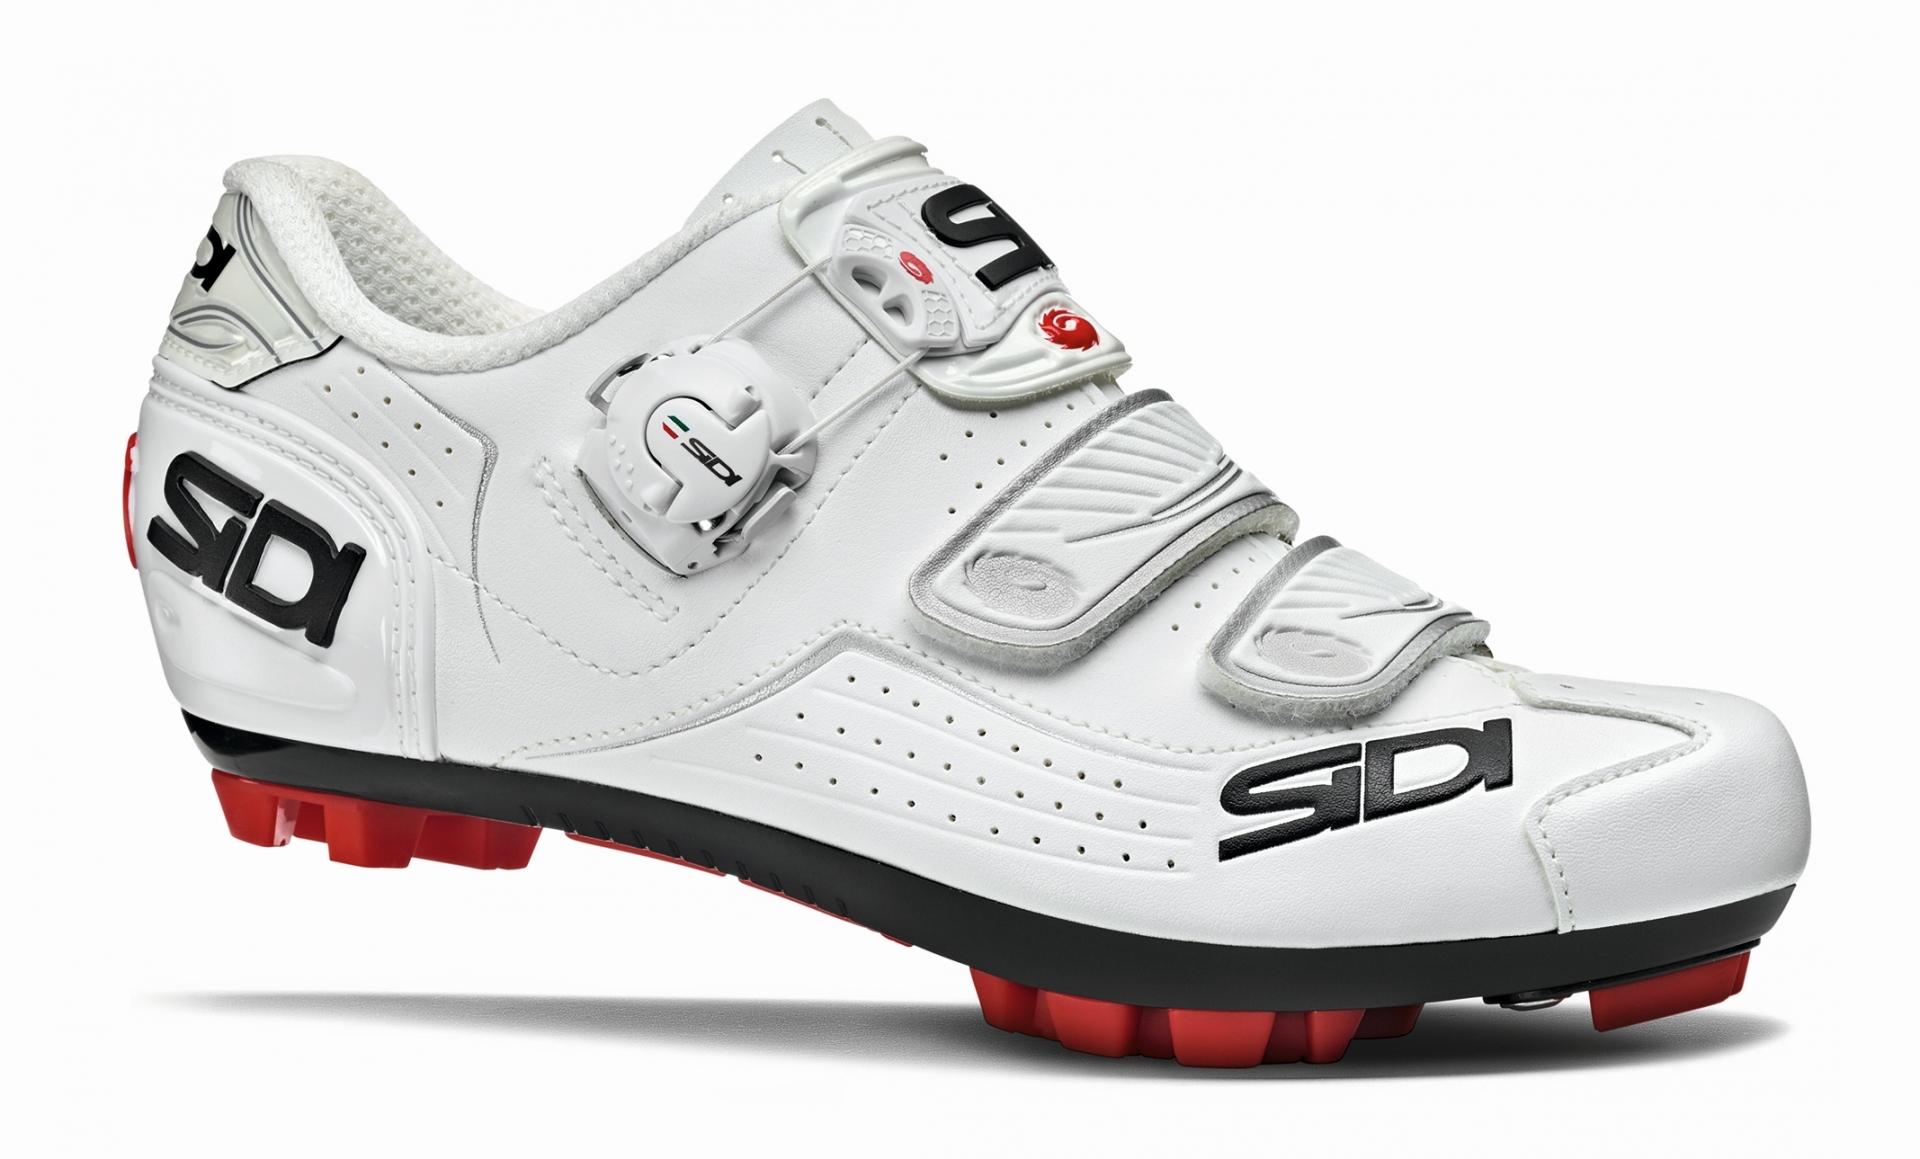 Chaussures VTT femme Sidi Trace W Blanc - 38